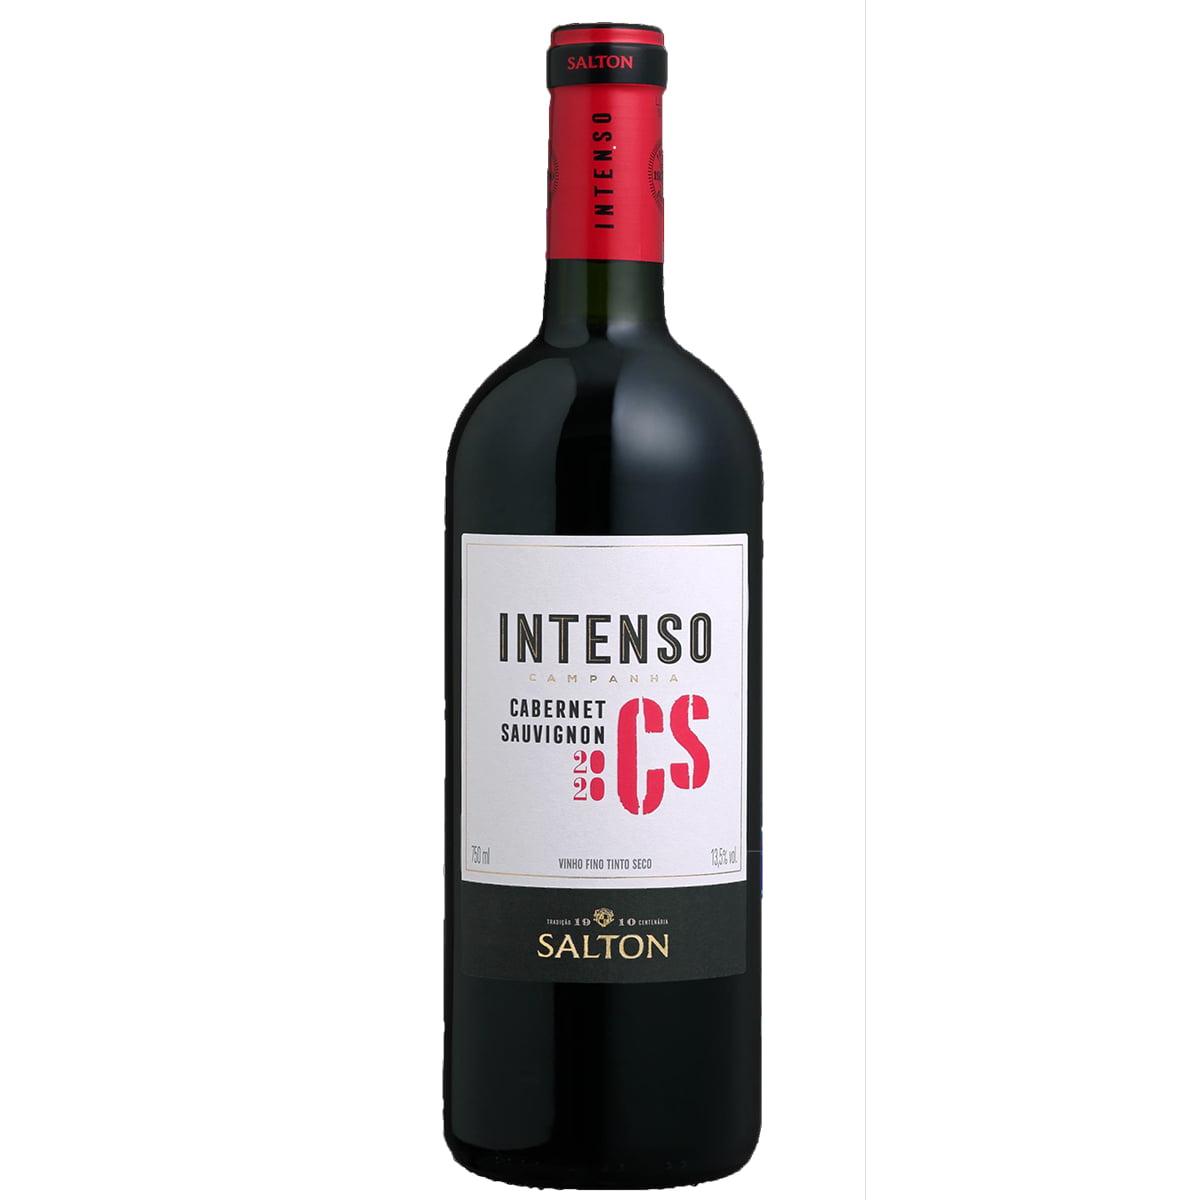 Vinho Salton Intenso Cabernet Sauvignon Tinto Seco 750ml